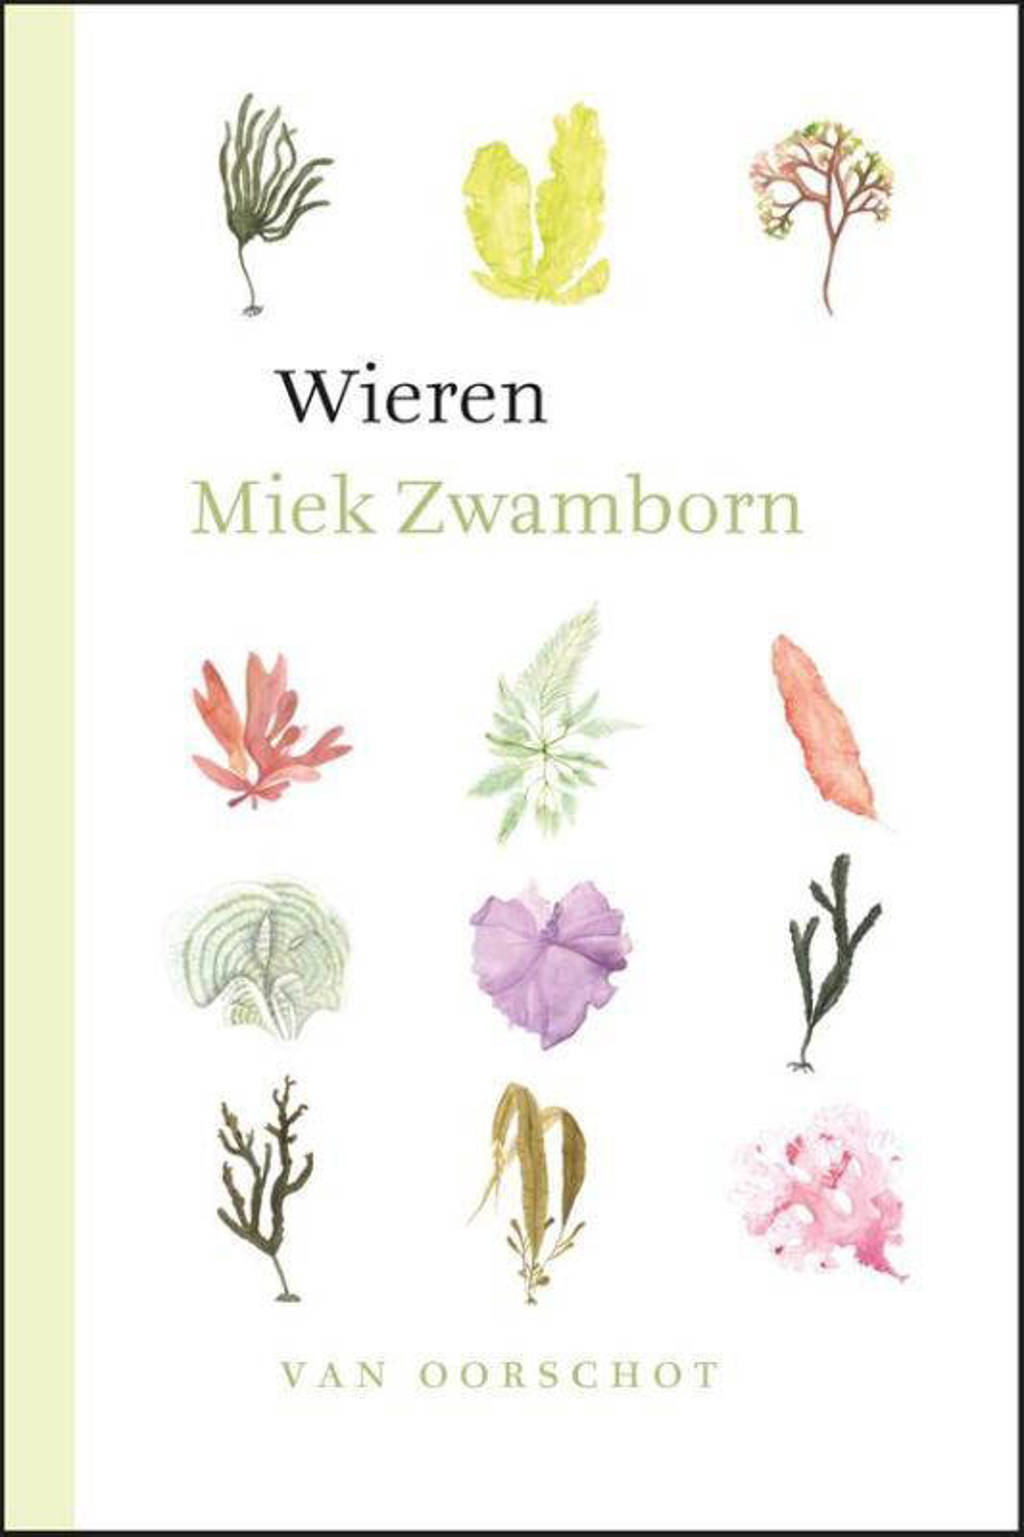 Wieren - Miek Zwamborn